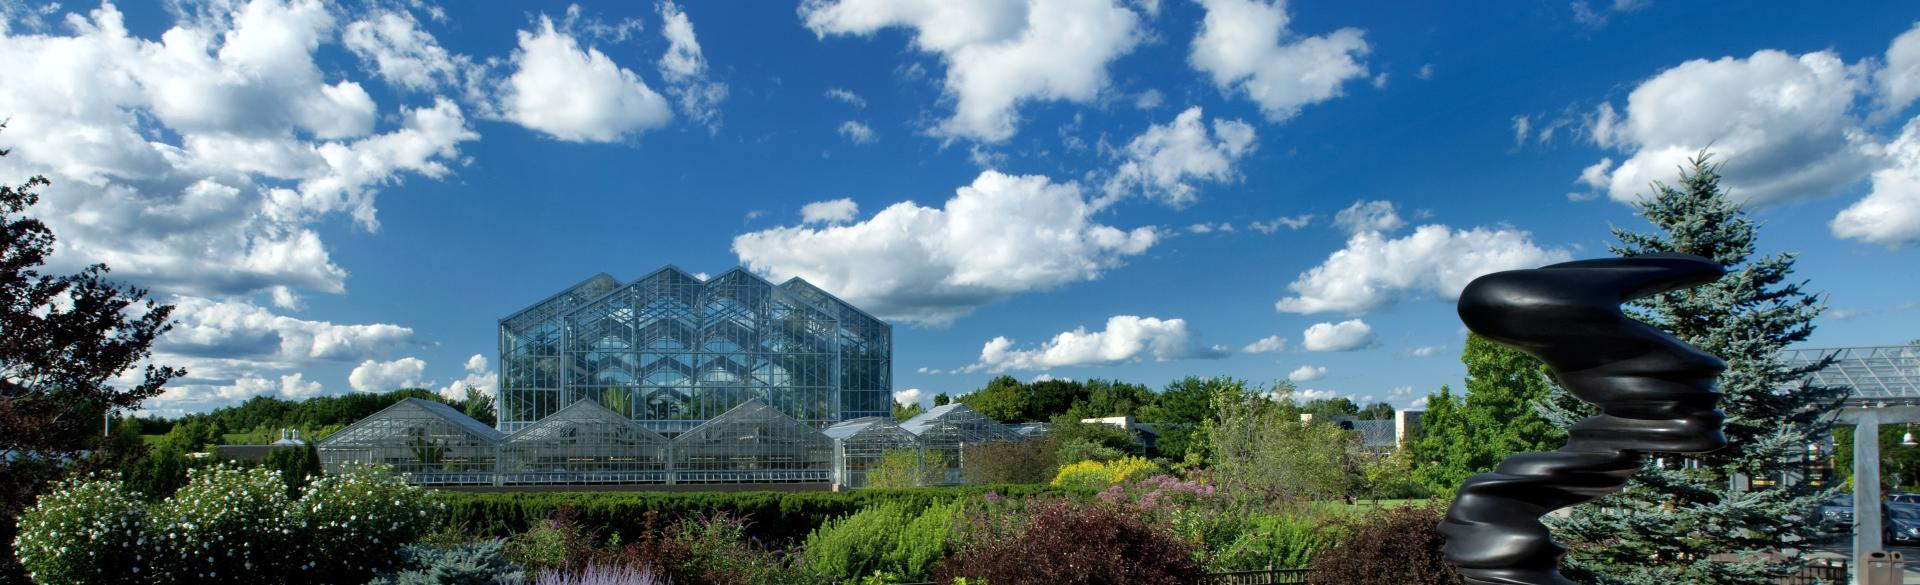 Frederik Meijer Gardens & Sculpture Park Exterior of Conservatory